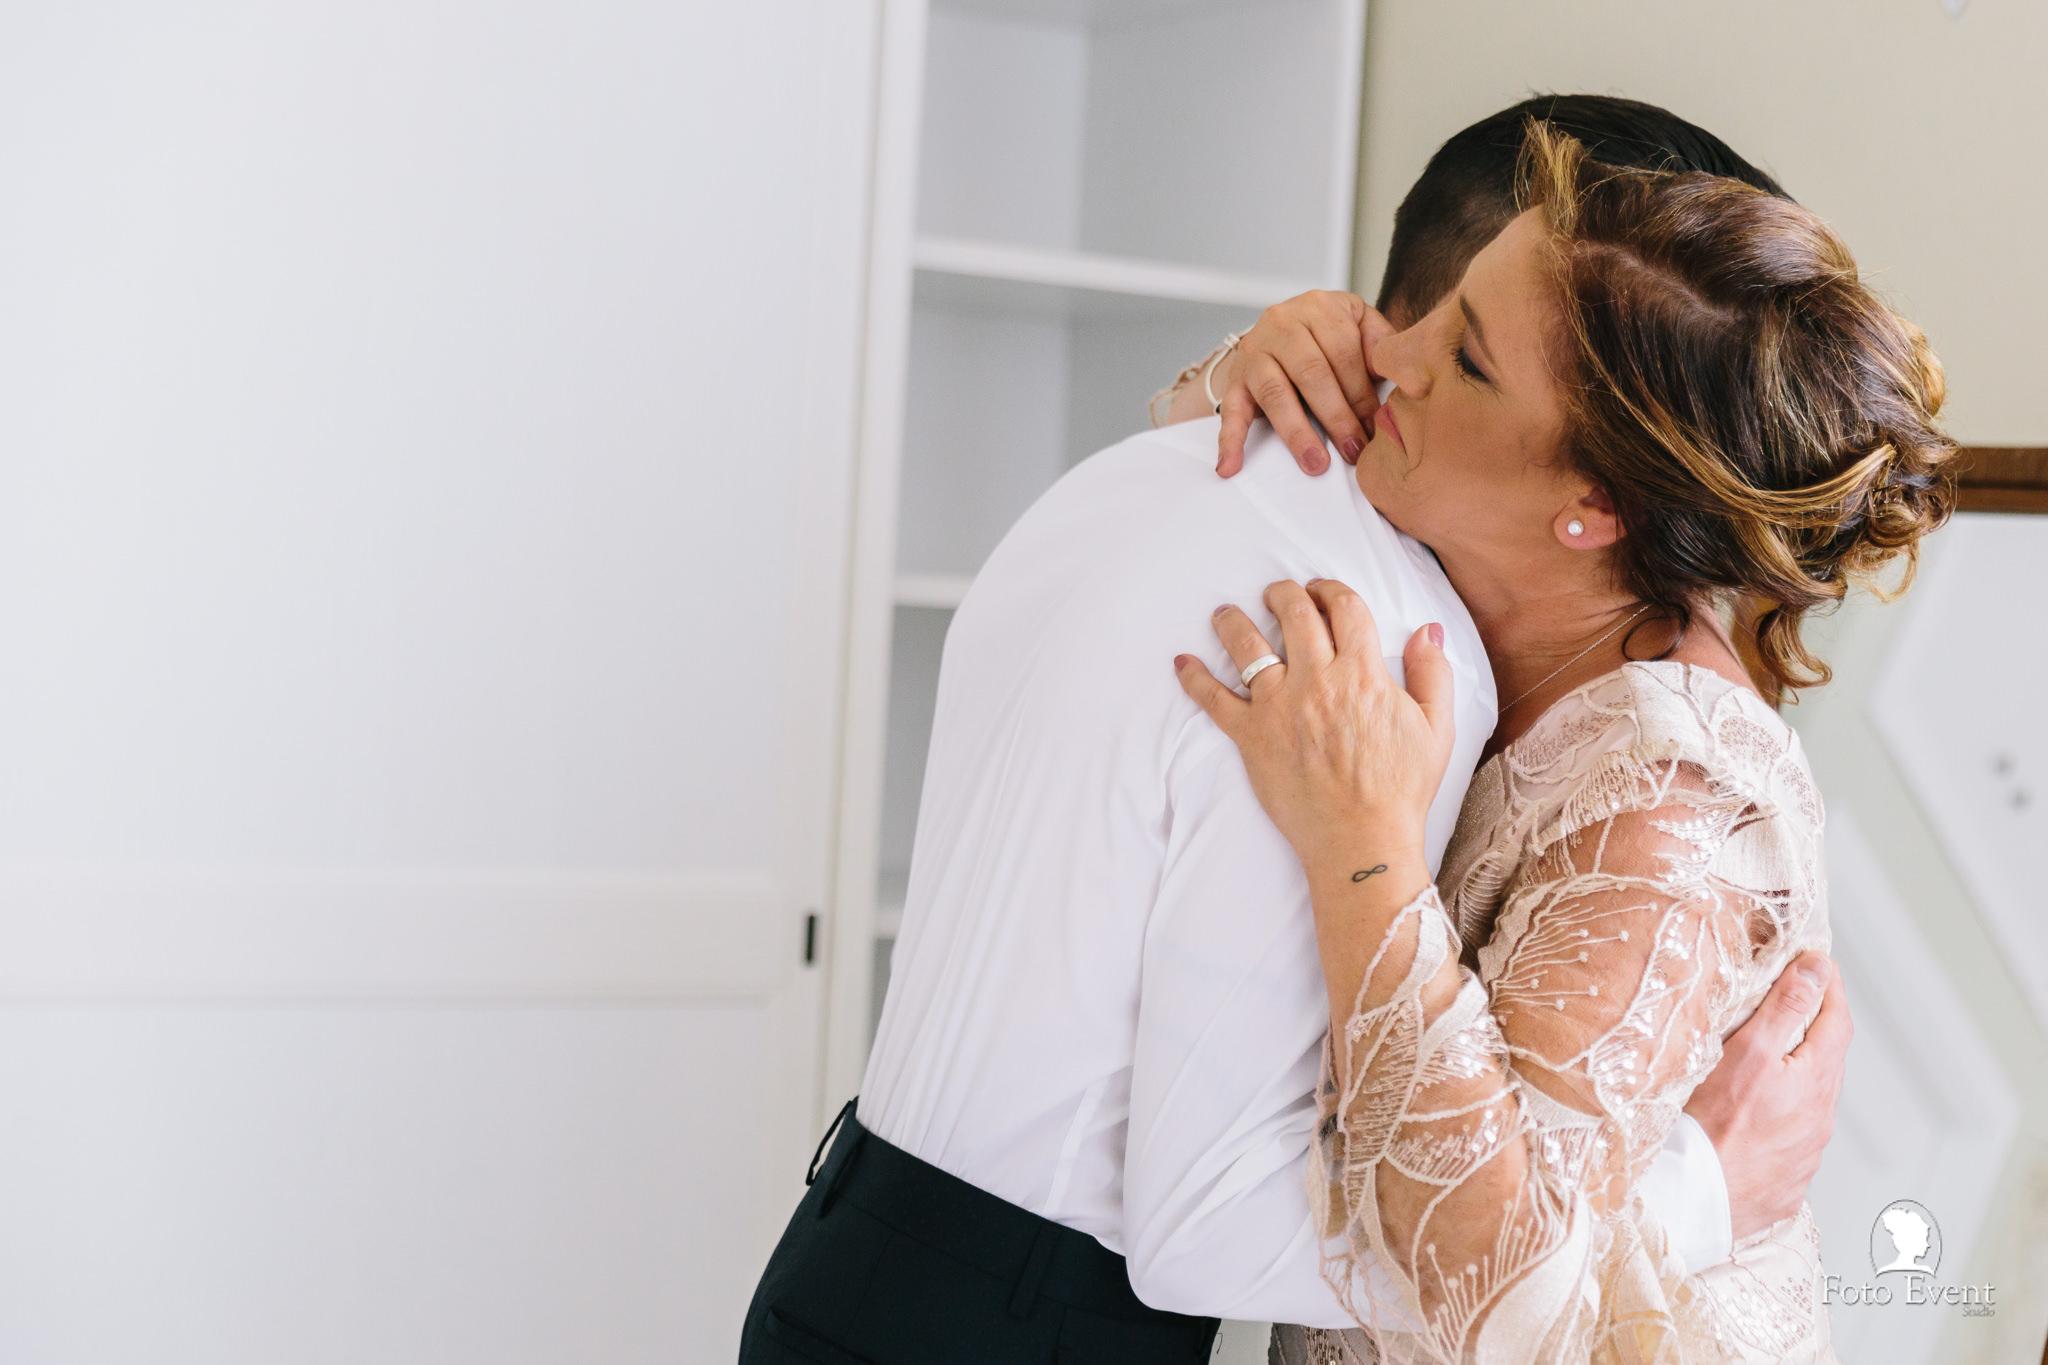 002-2019-08-31-Matrimonio-Serena-e-Saverio-Tarantino-5DE-046